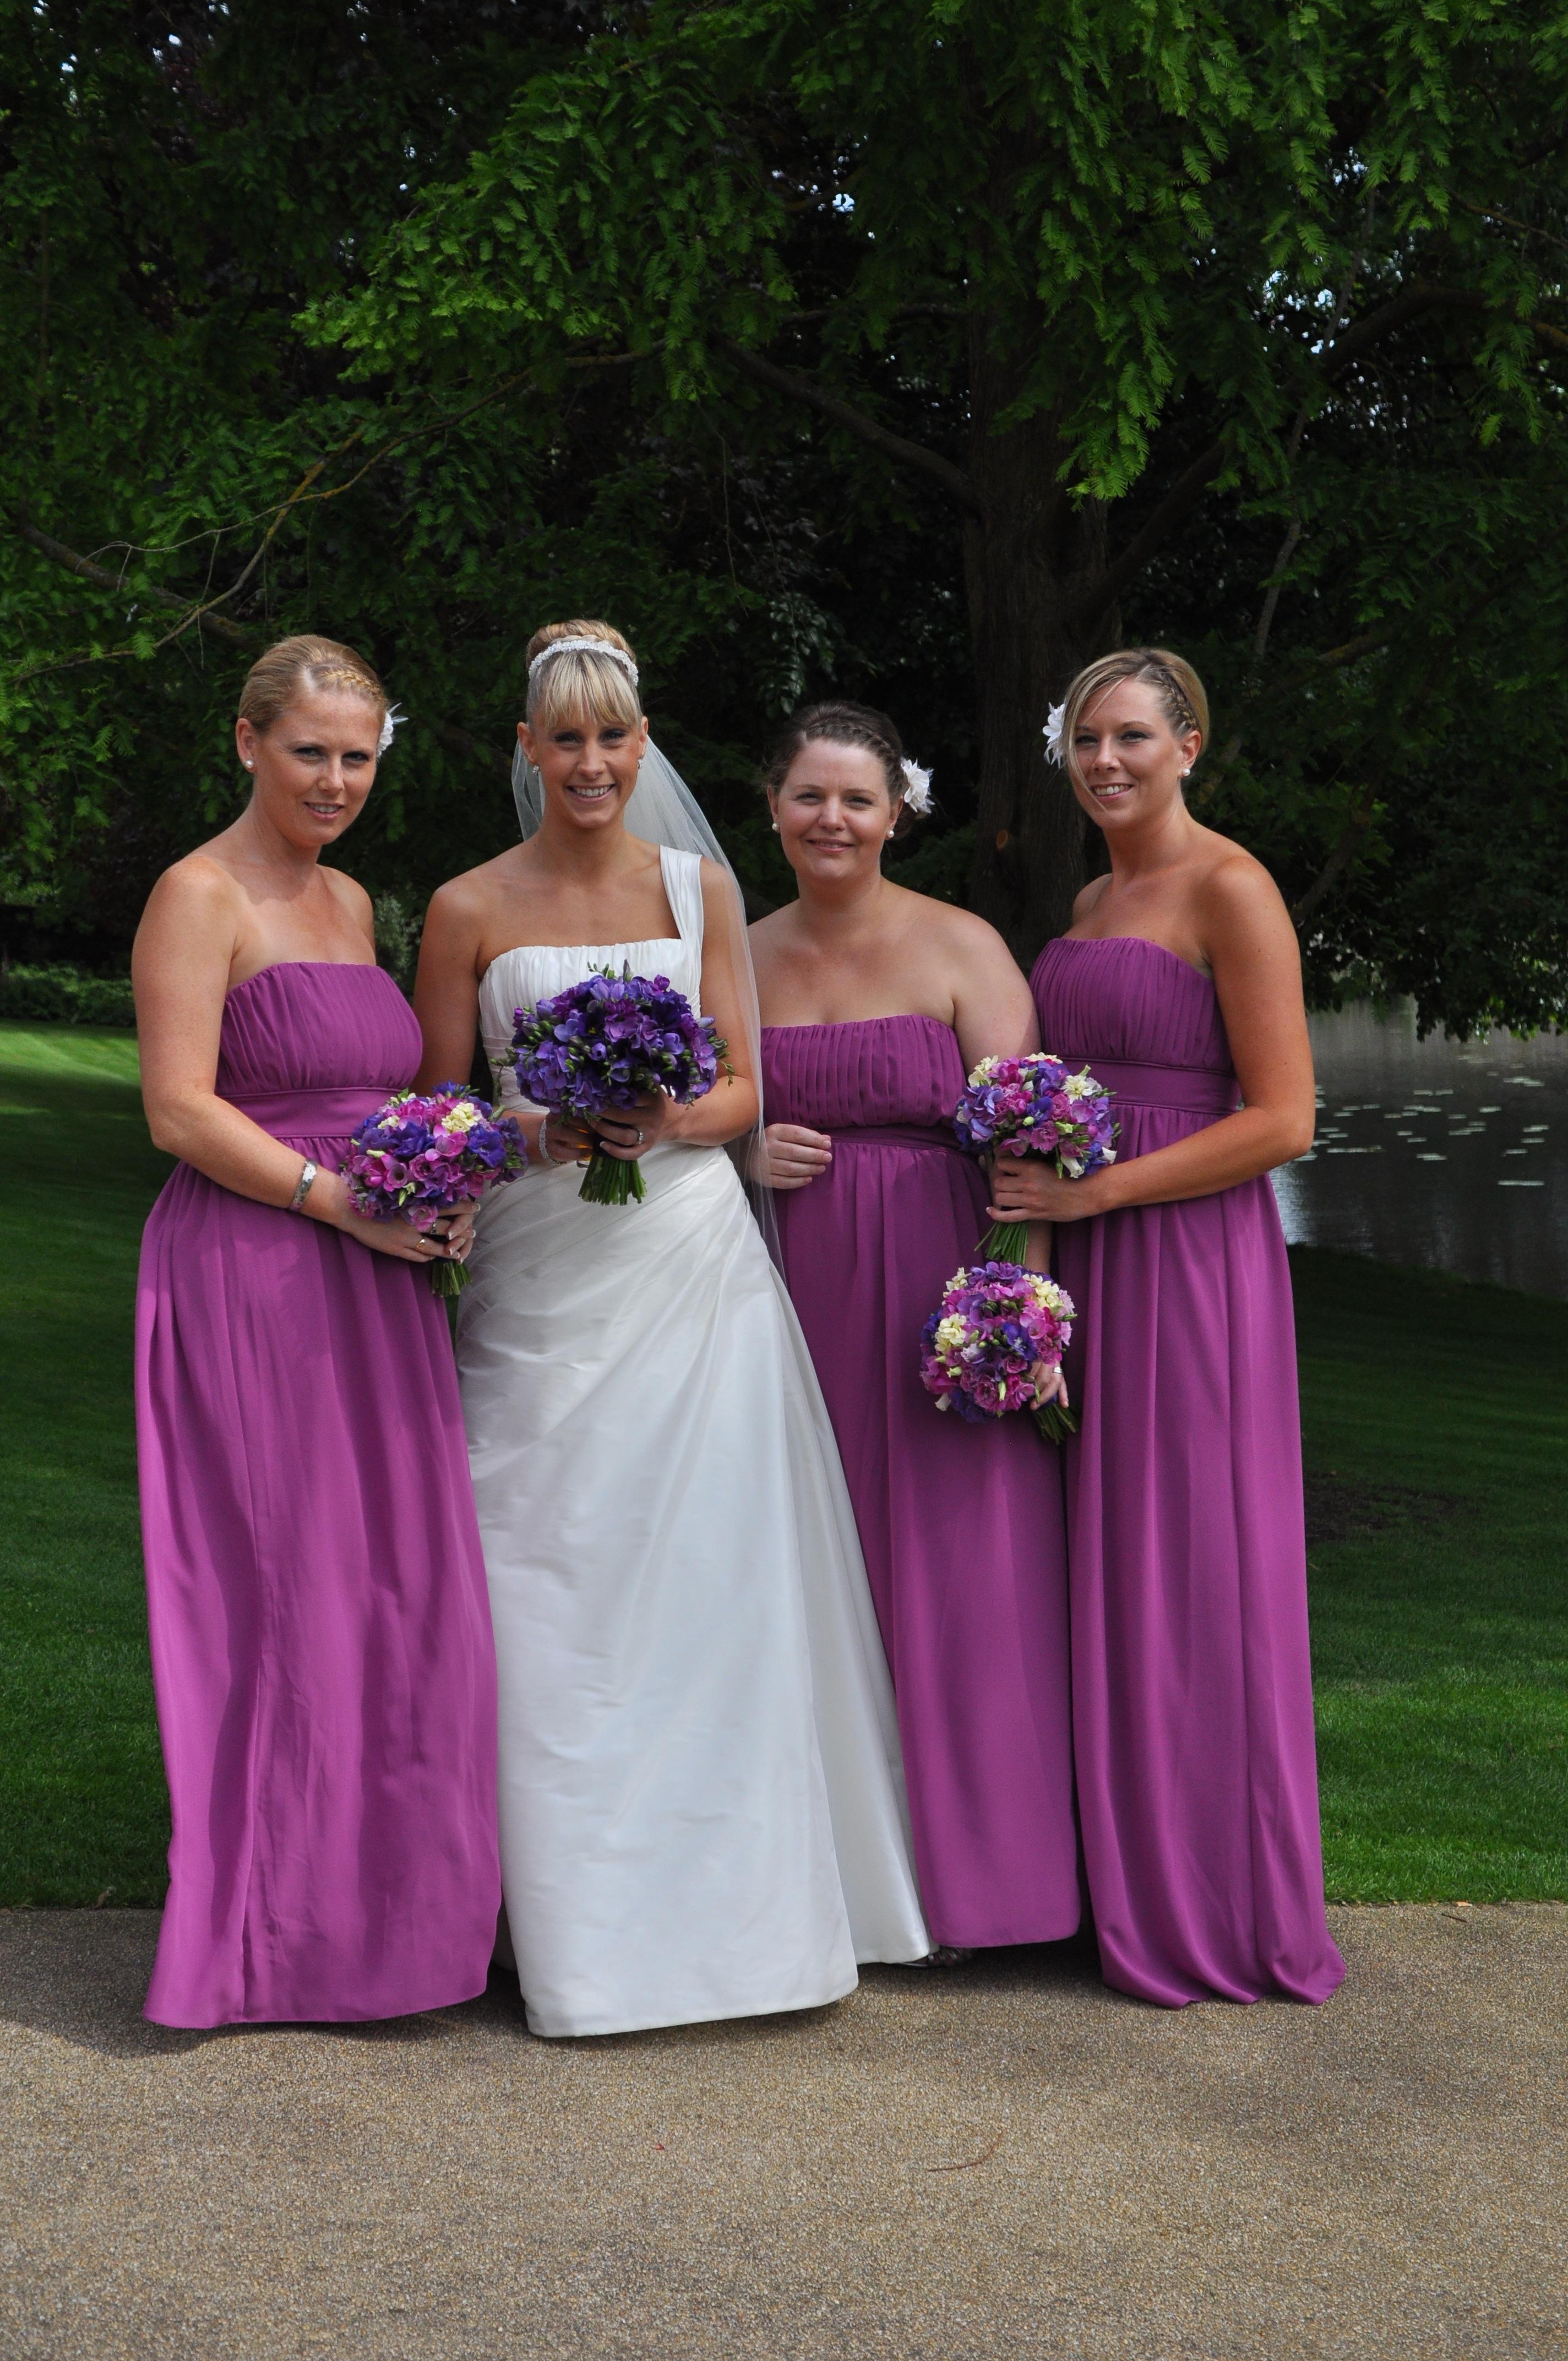 Bride & Bridesmaids | Brides & Bridesmaids | Pinterest | Monsoon ...